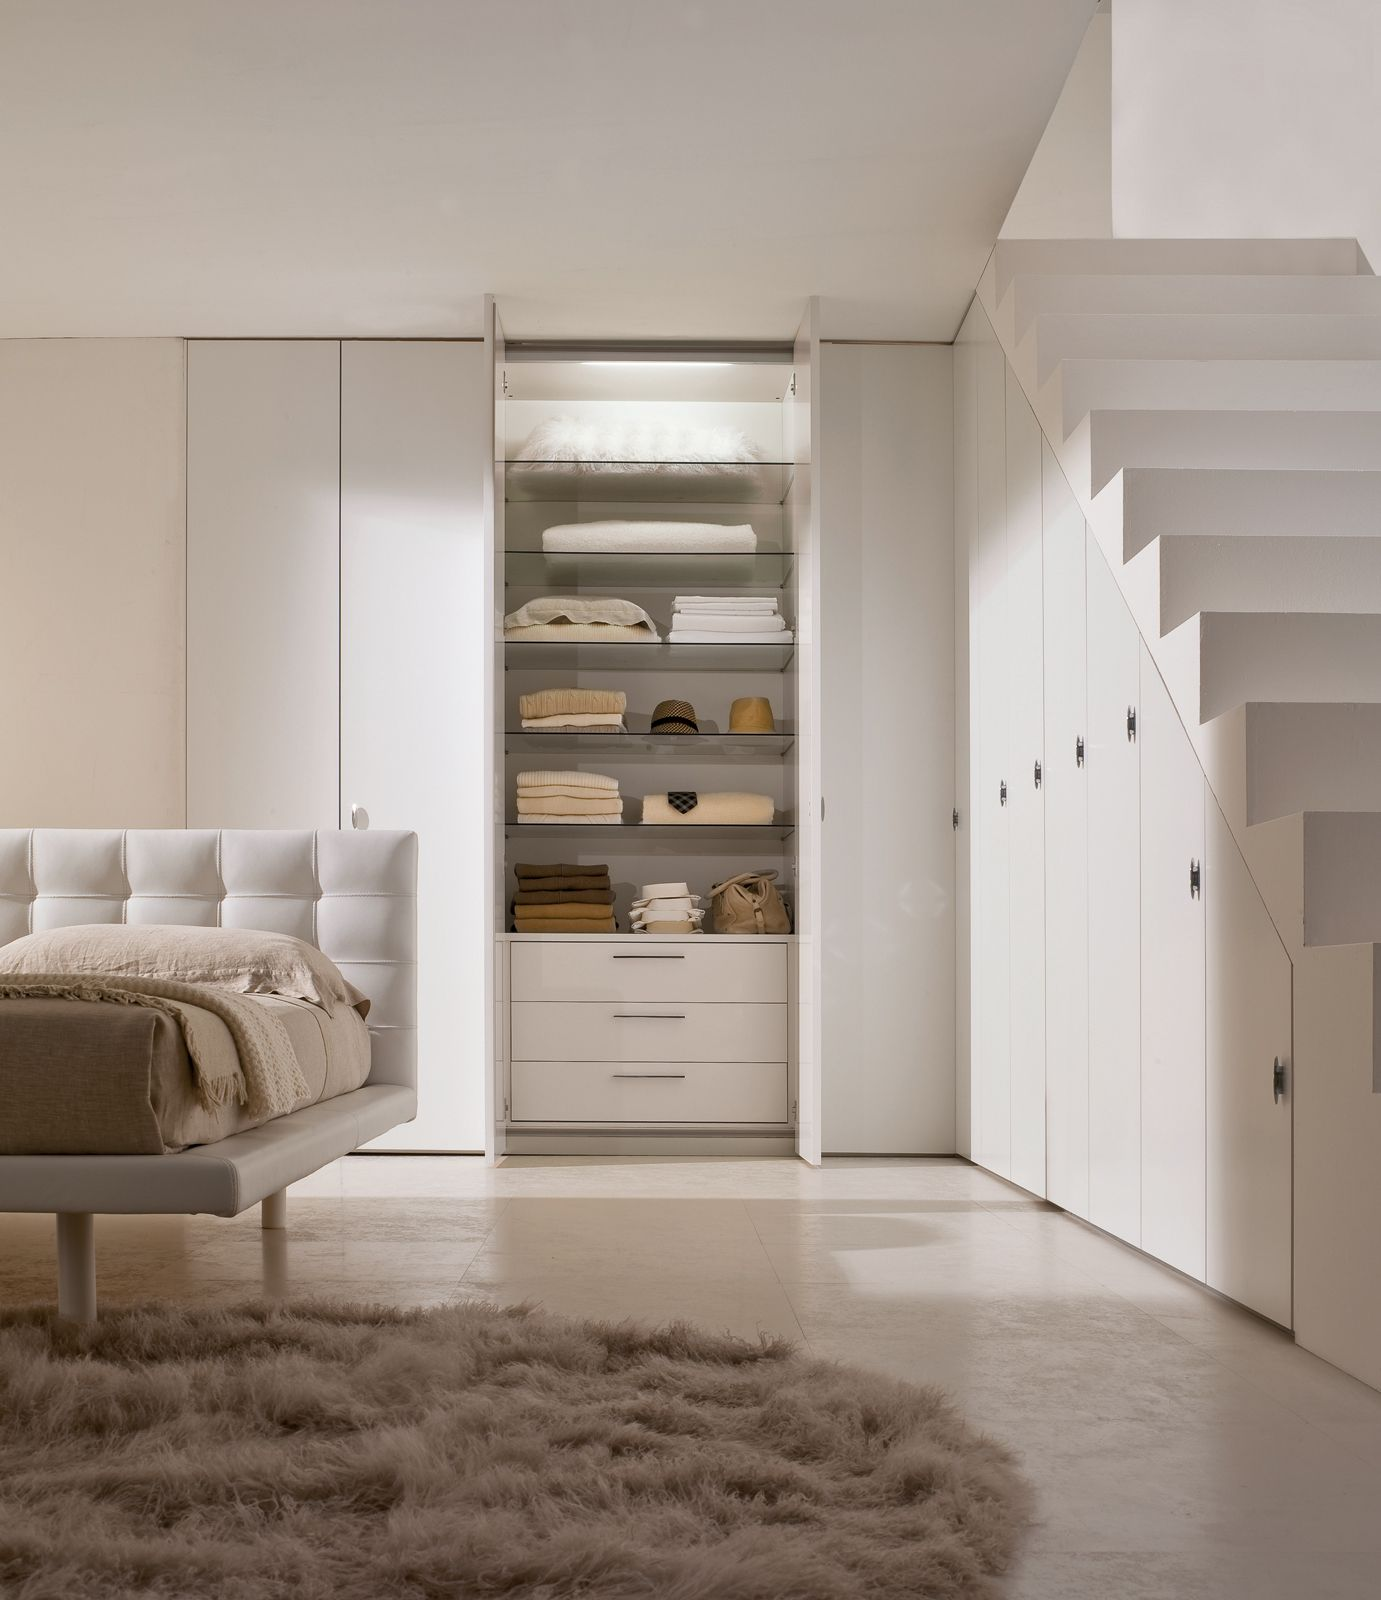 La Falegnami: armadi su misura   Pinterest   Lofts, Interiors and House